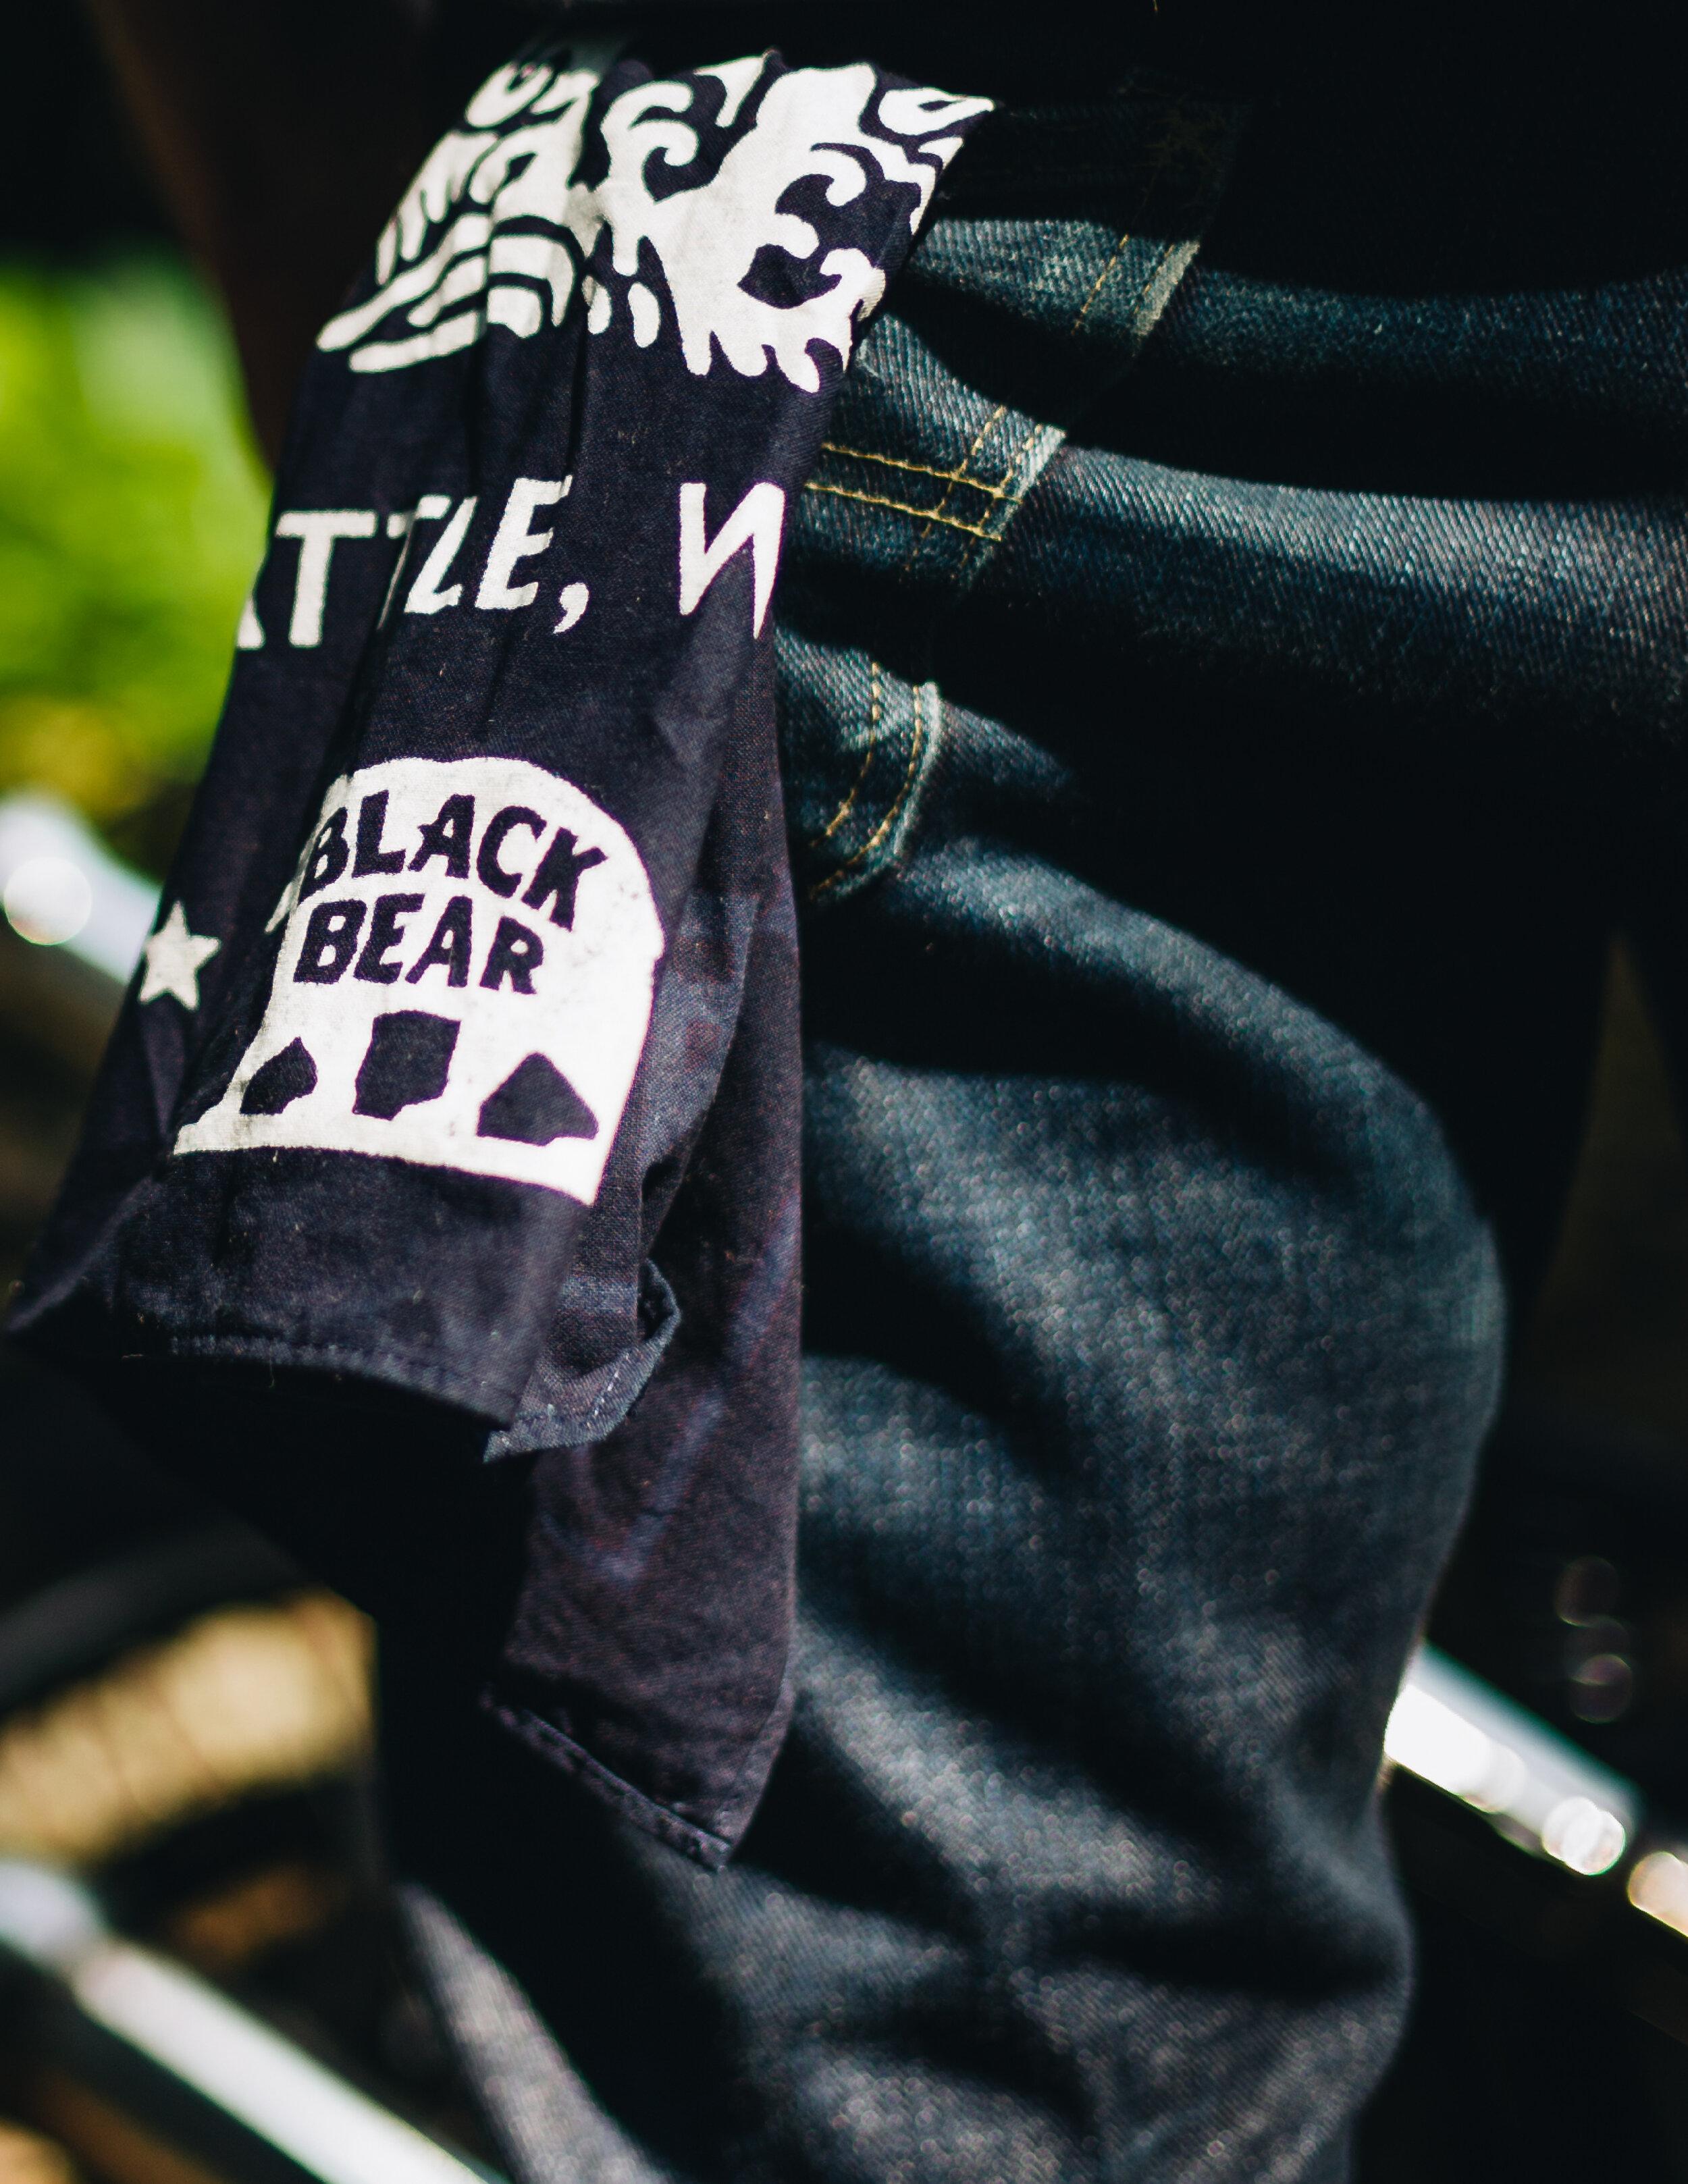 Black Bear Brand indigo bandana